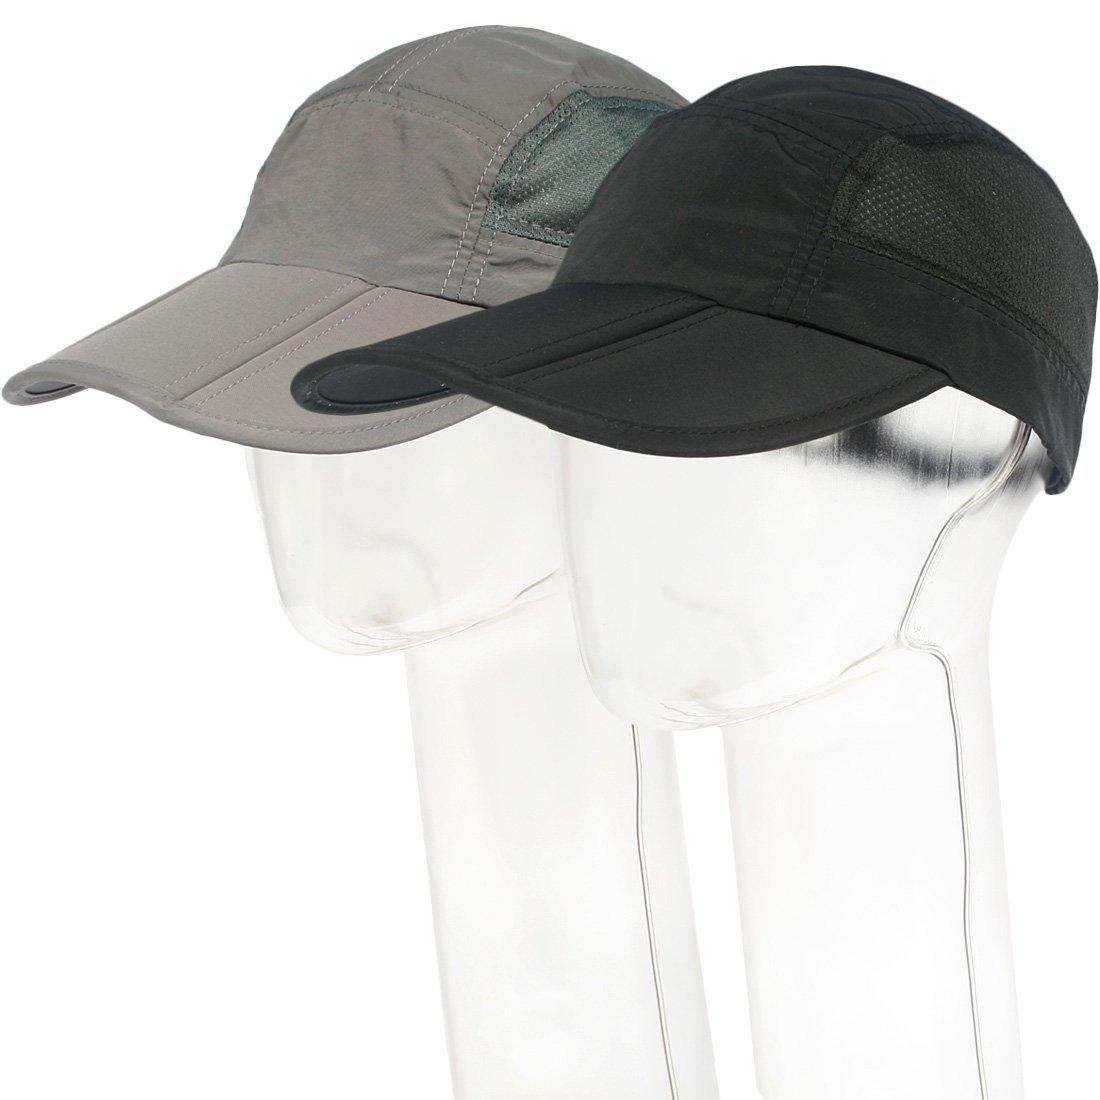 kilofly Mens Foldable Lightweight Quick Dry Adjustable Outdoor Cap, Set of 2 AMA601set2A